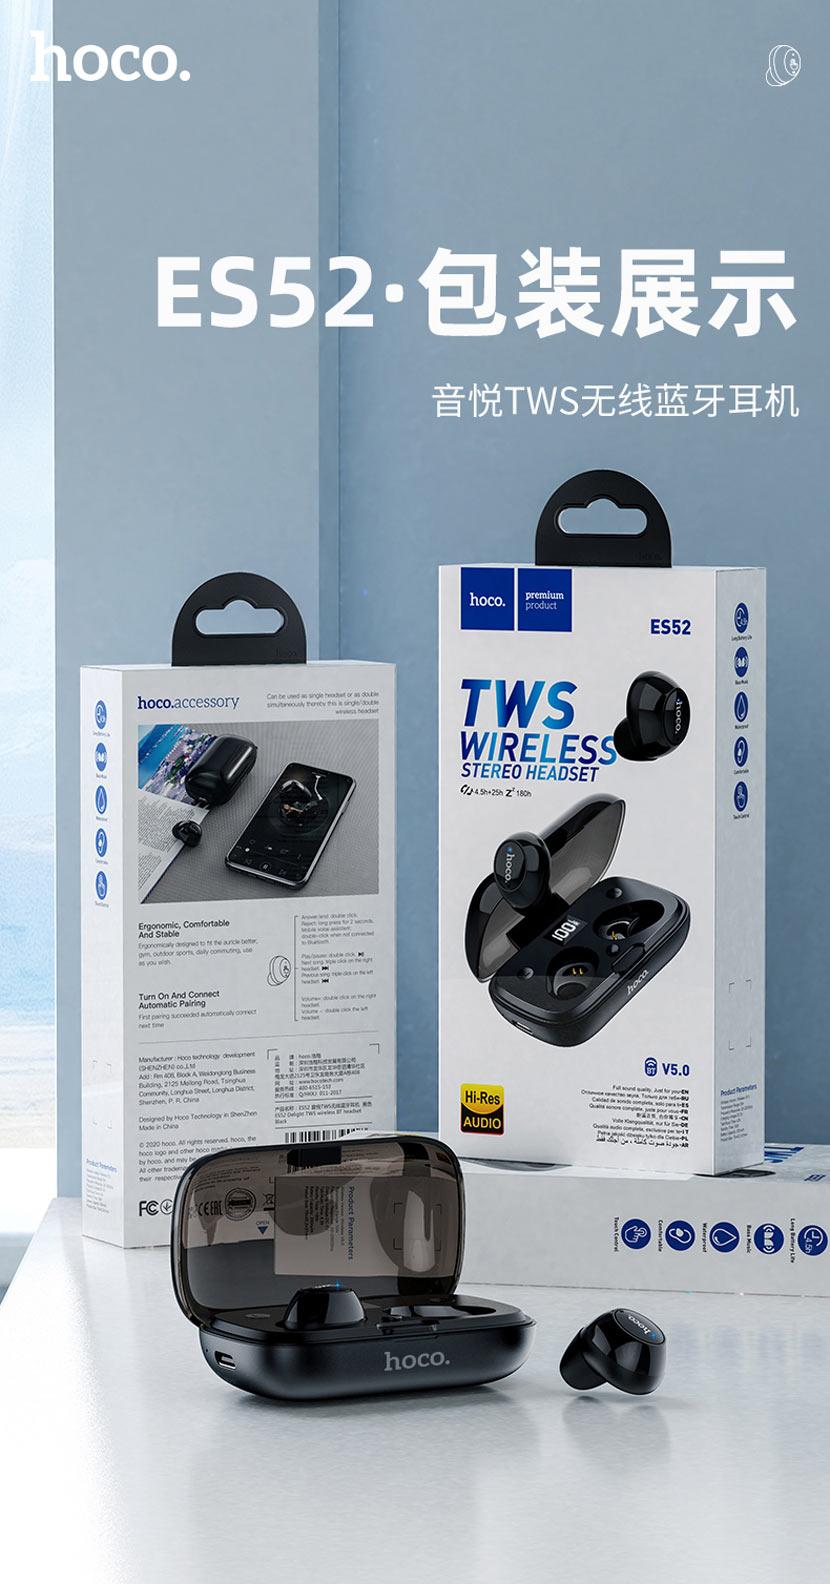 hoco news es52 delight tws wireless bt headset package cn